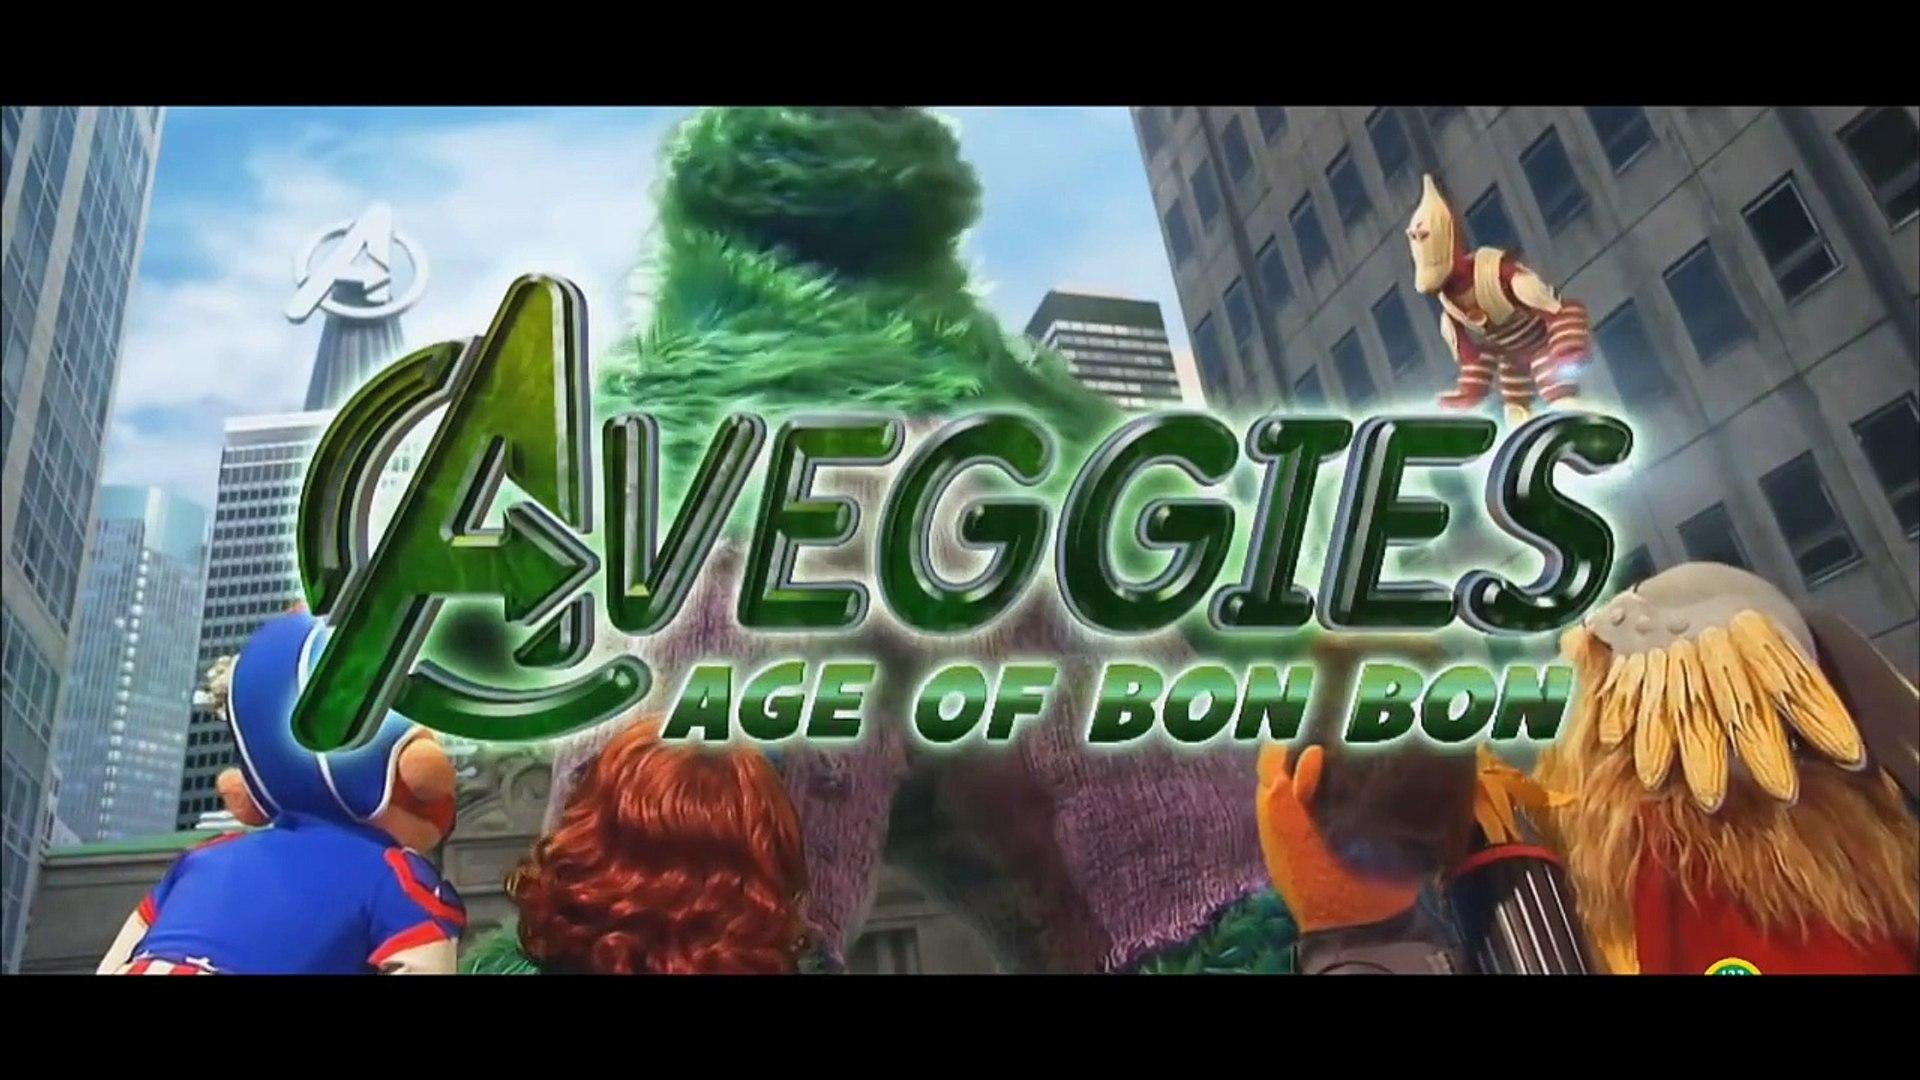 Sesame Street Parodies 'Avengers: Age of Ultron'